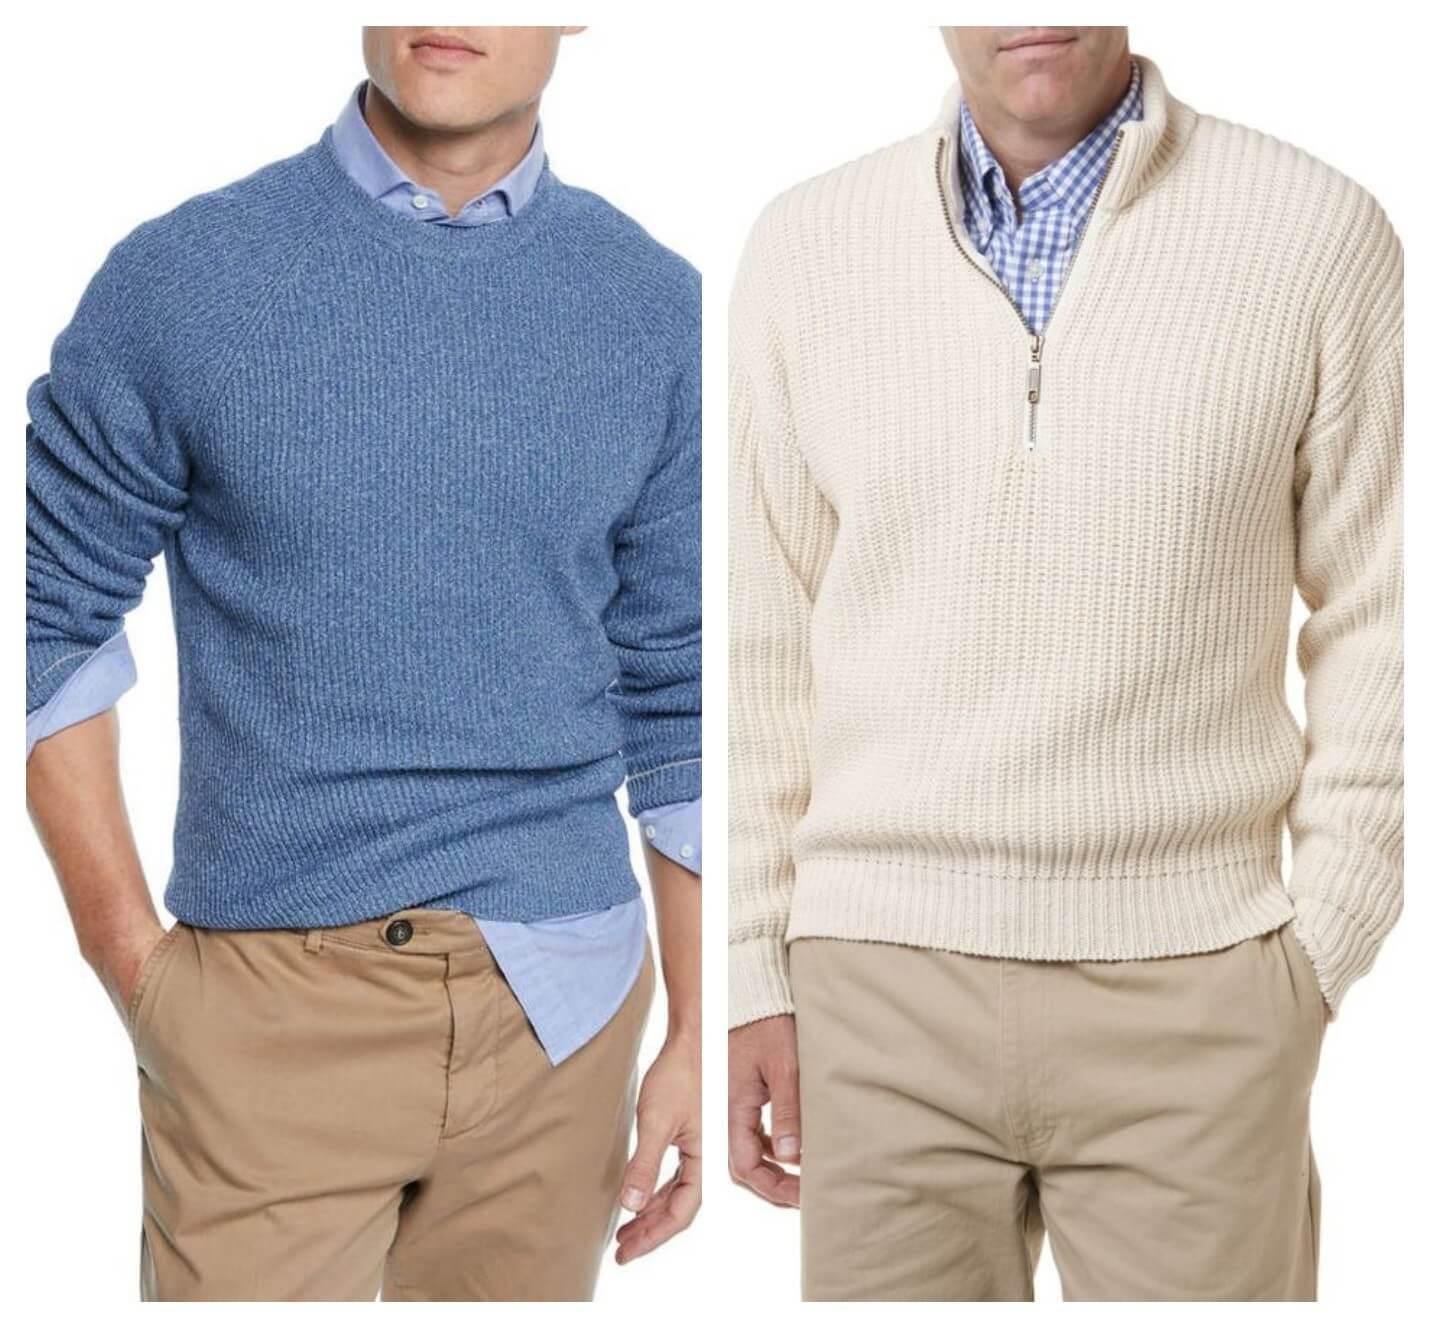 سویشرت و پیراهن مردانه